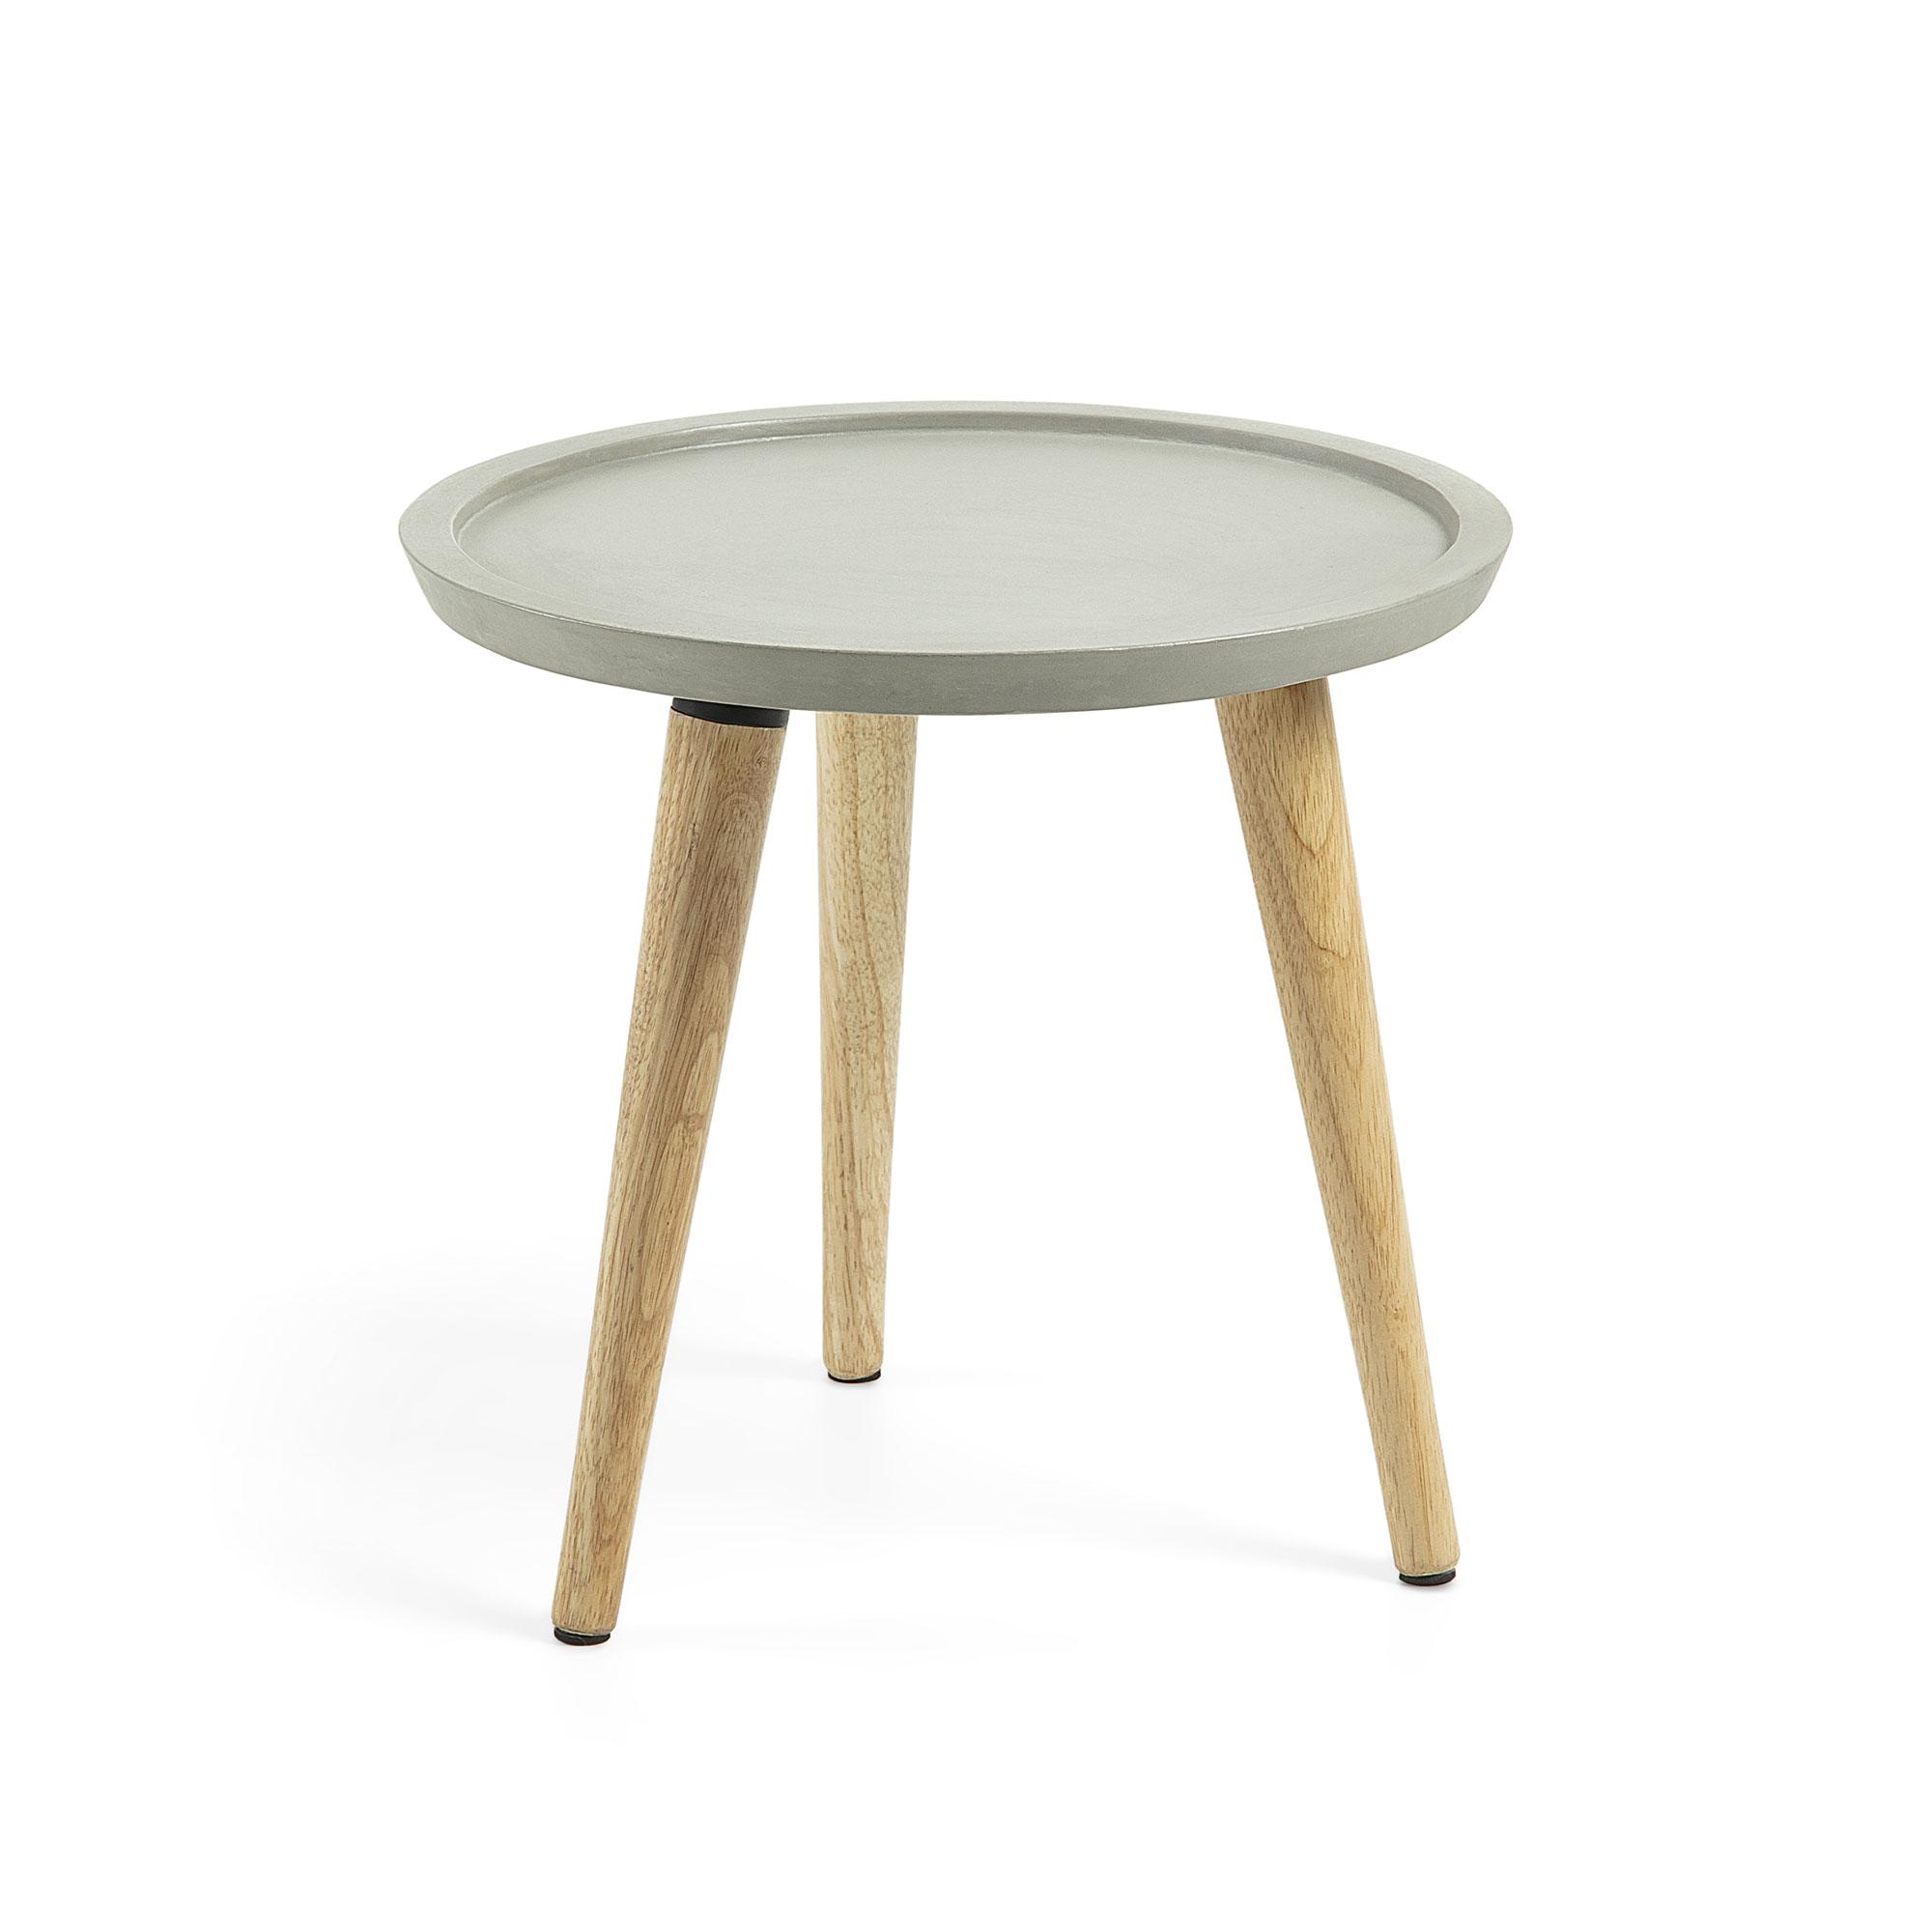 laforma laforma livy sidebord - grå/natur cement/gummitræ, rund (ø40)